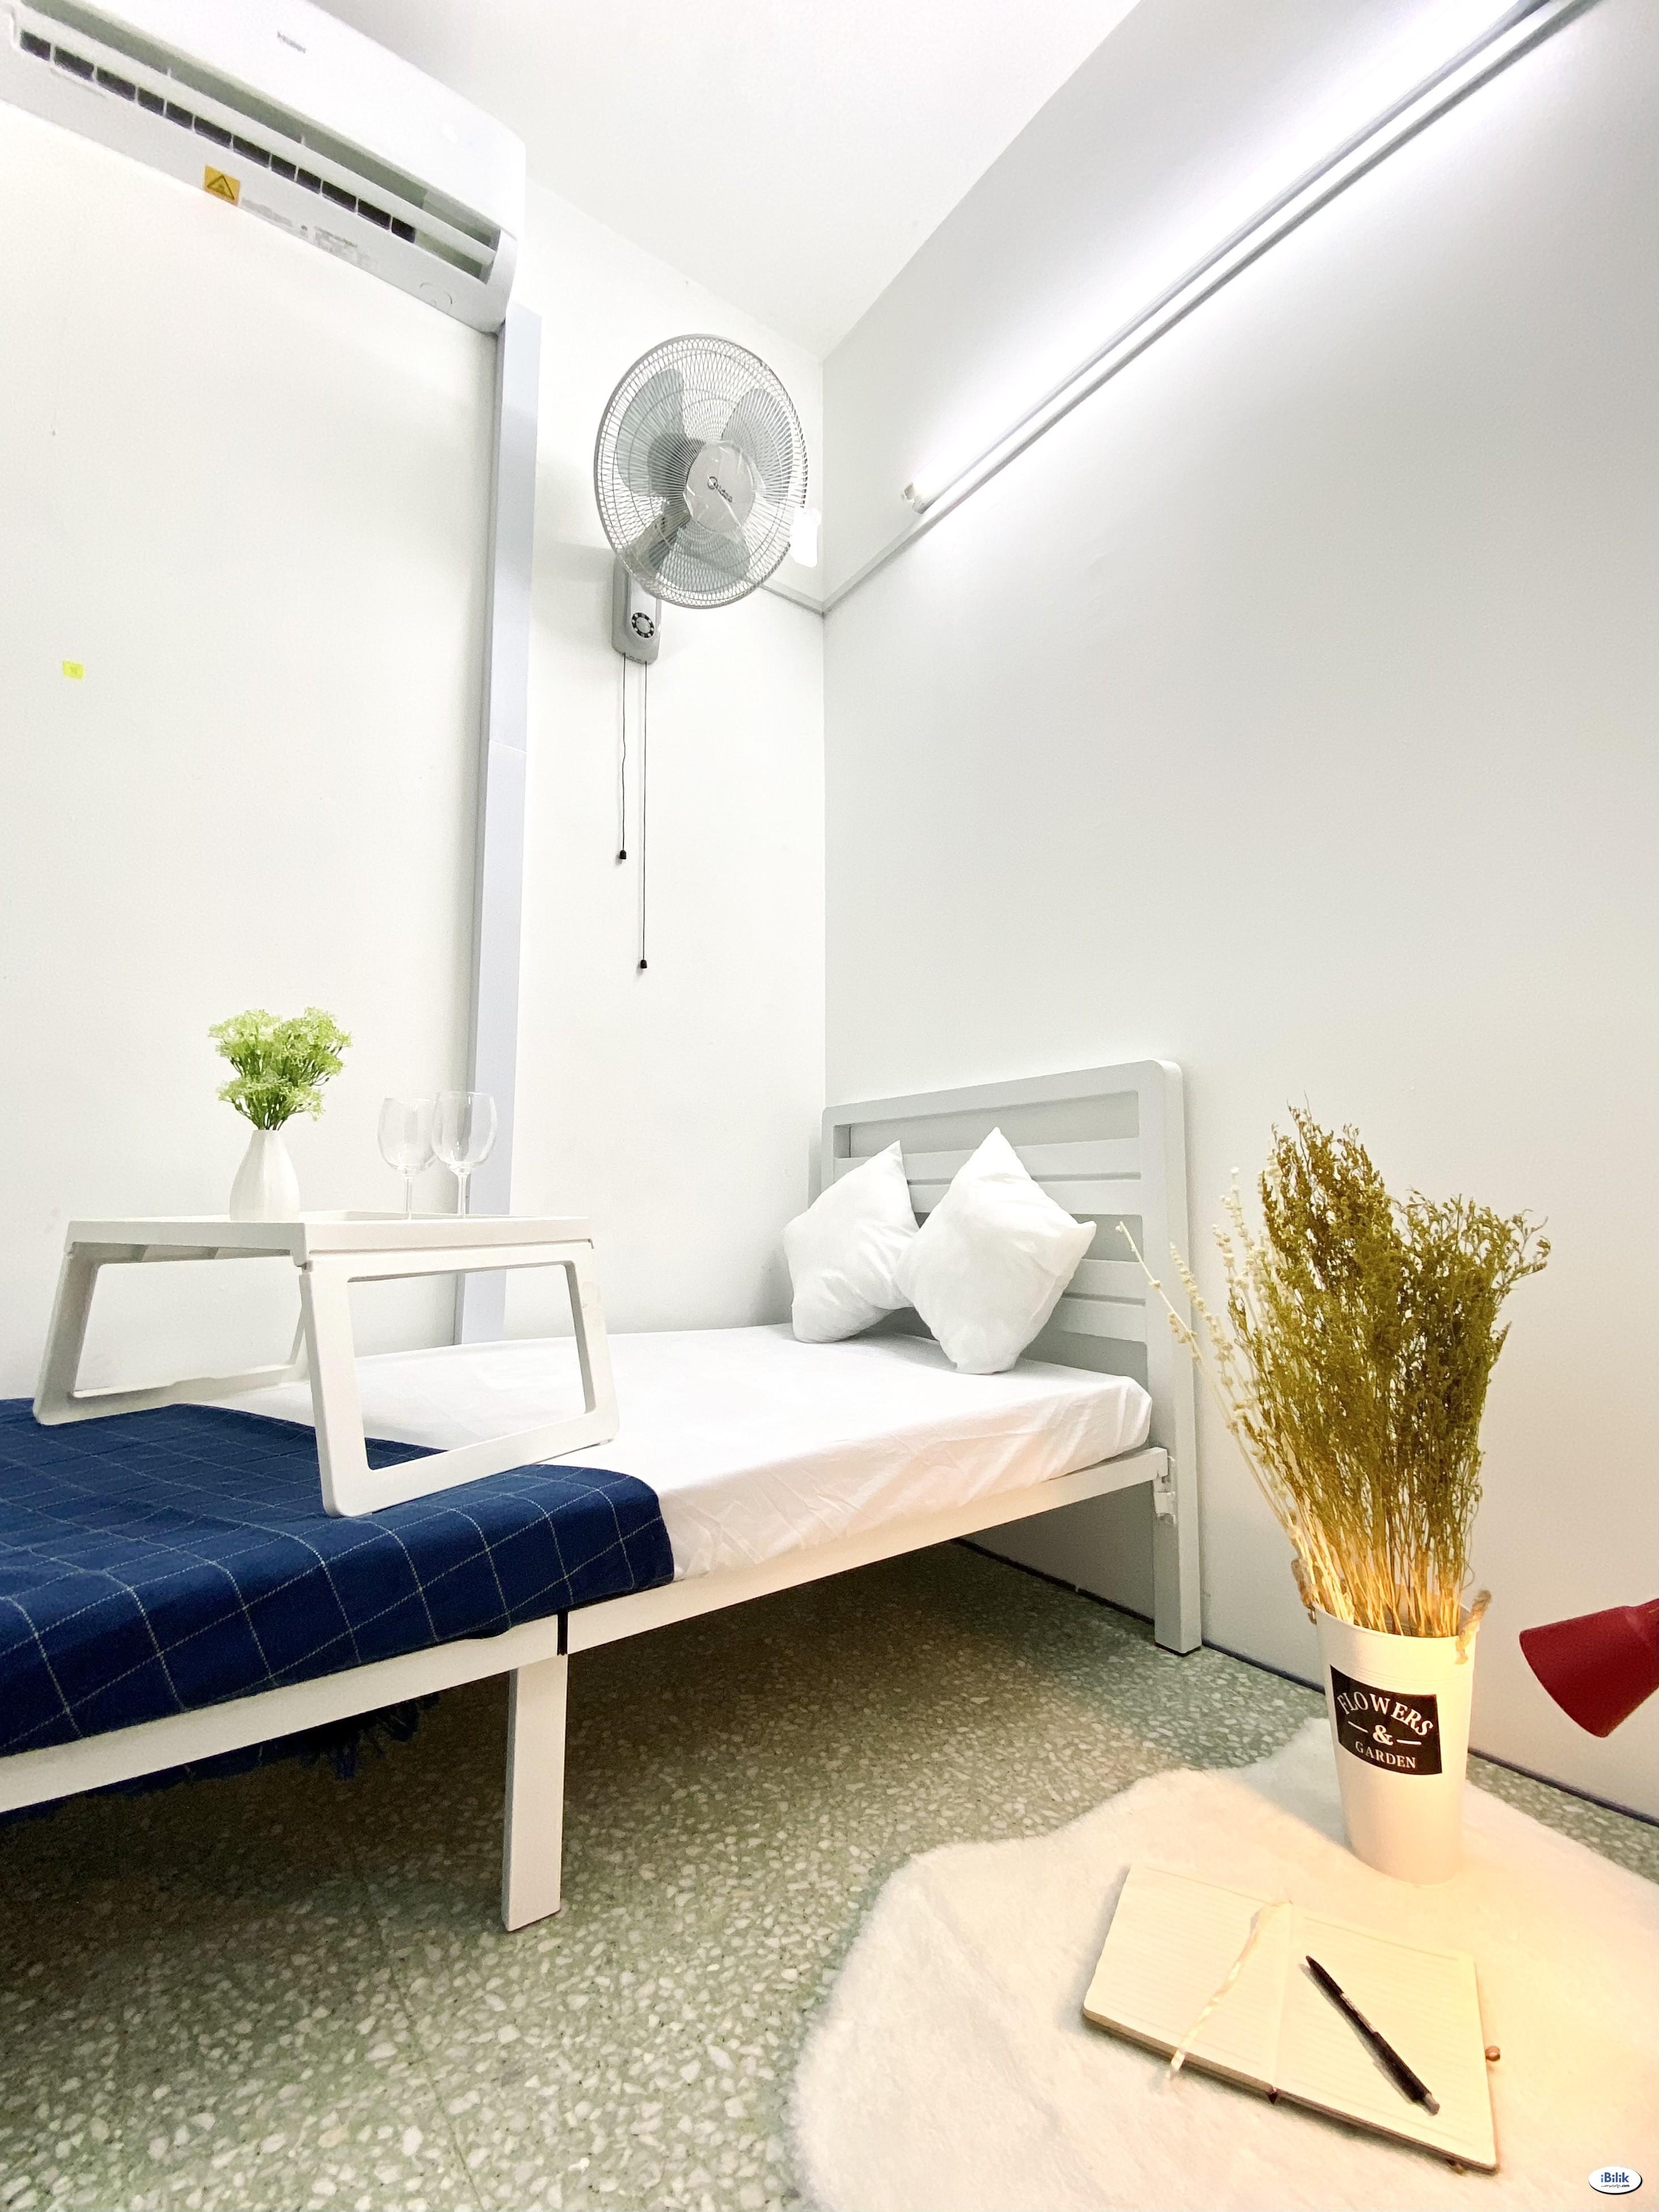 FREE HIGH SPEE WIFI 🚀 Single Room at Setia Alam, Shah Alam